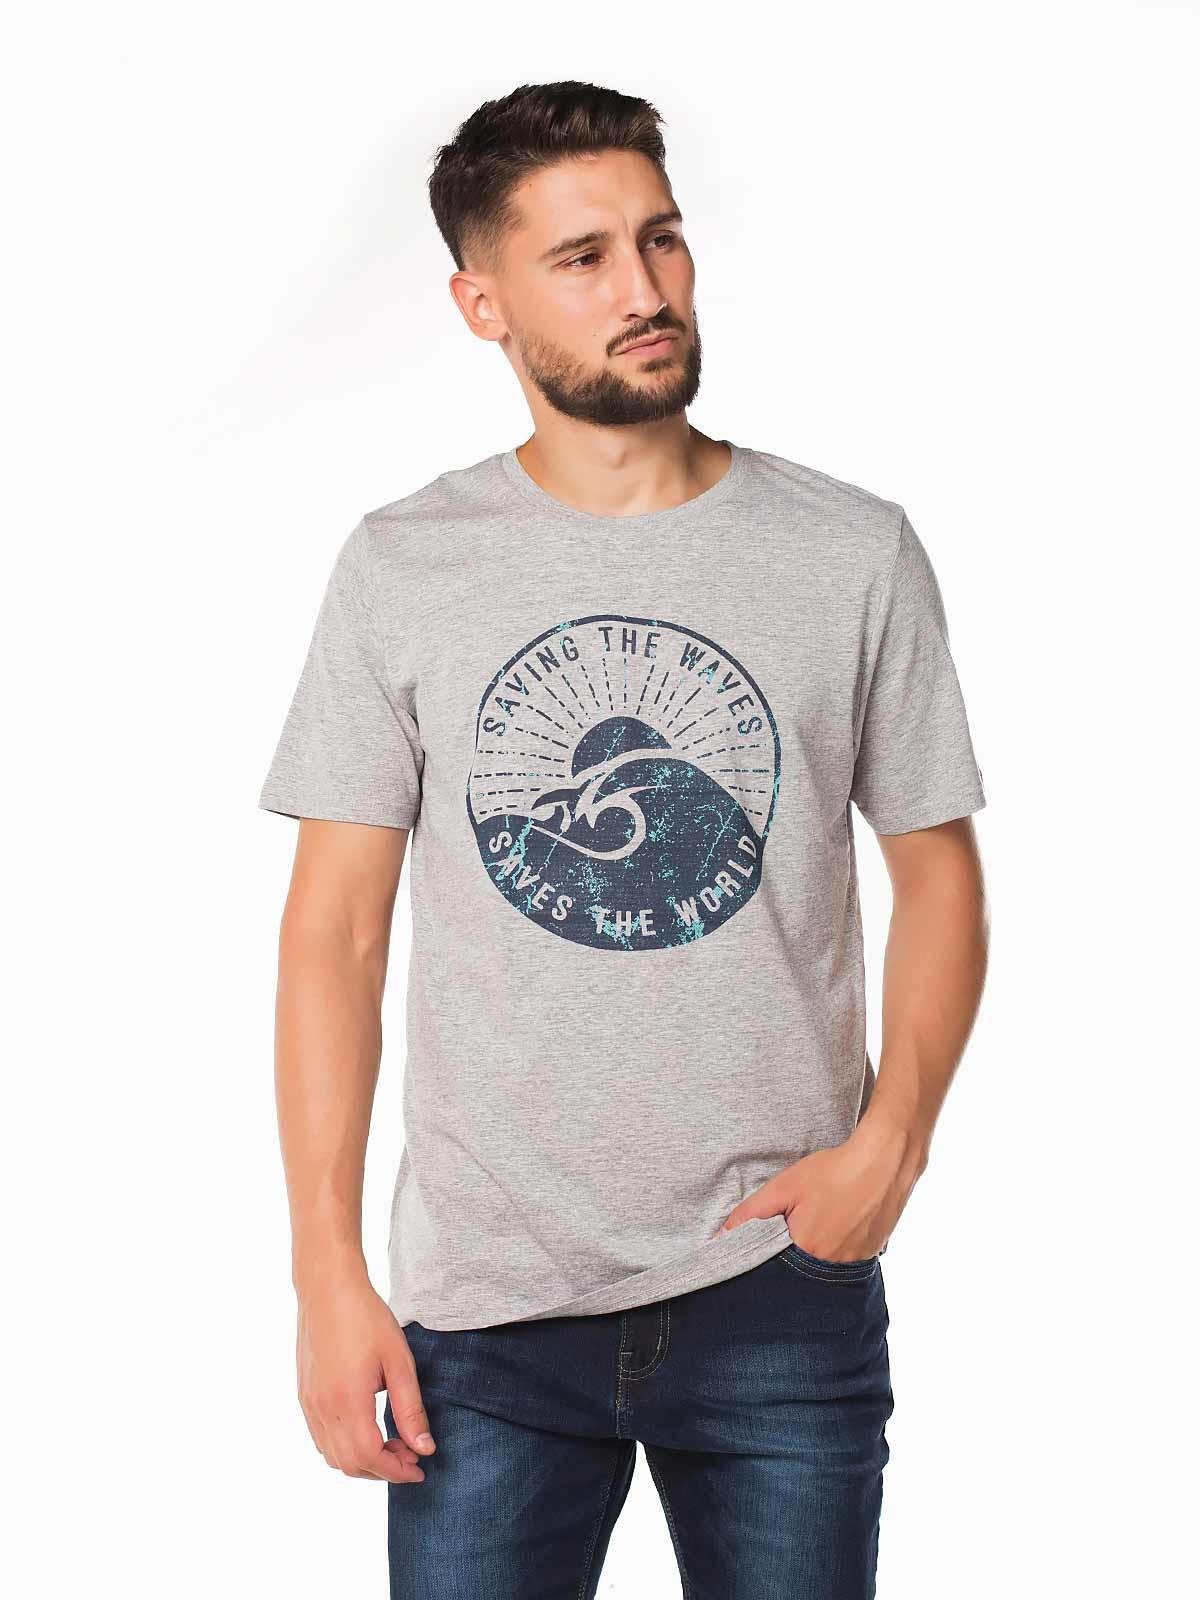 Camiseta hombre manga corta Waves